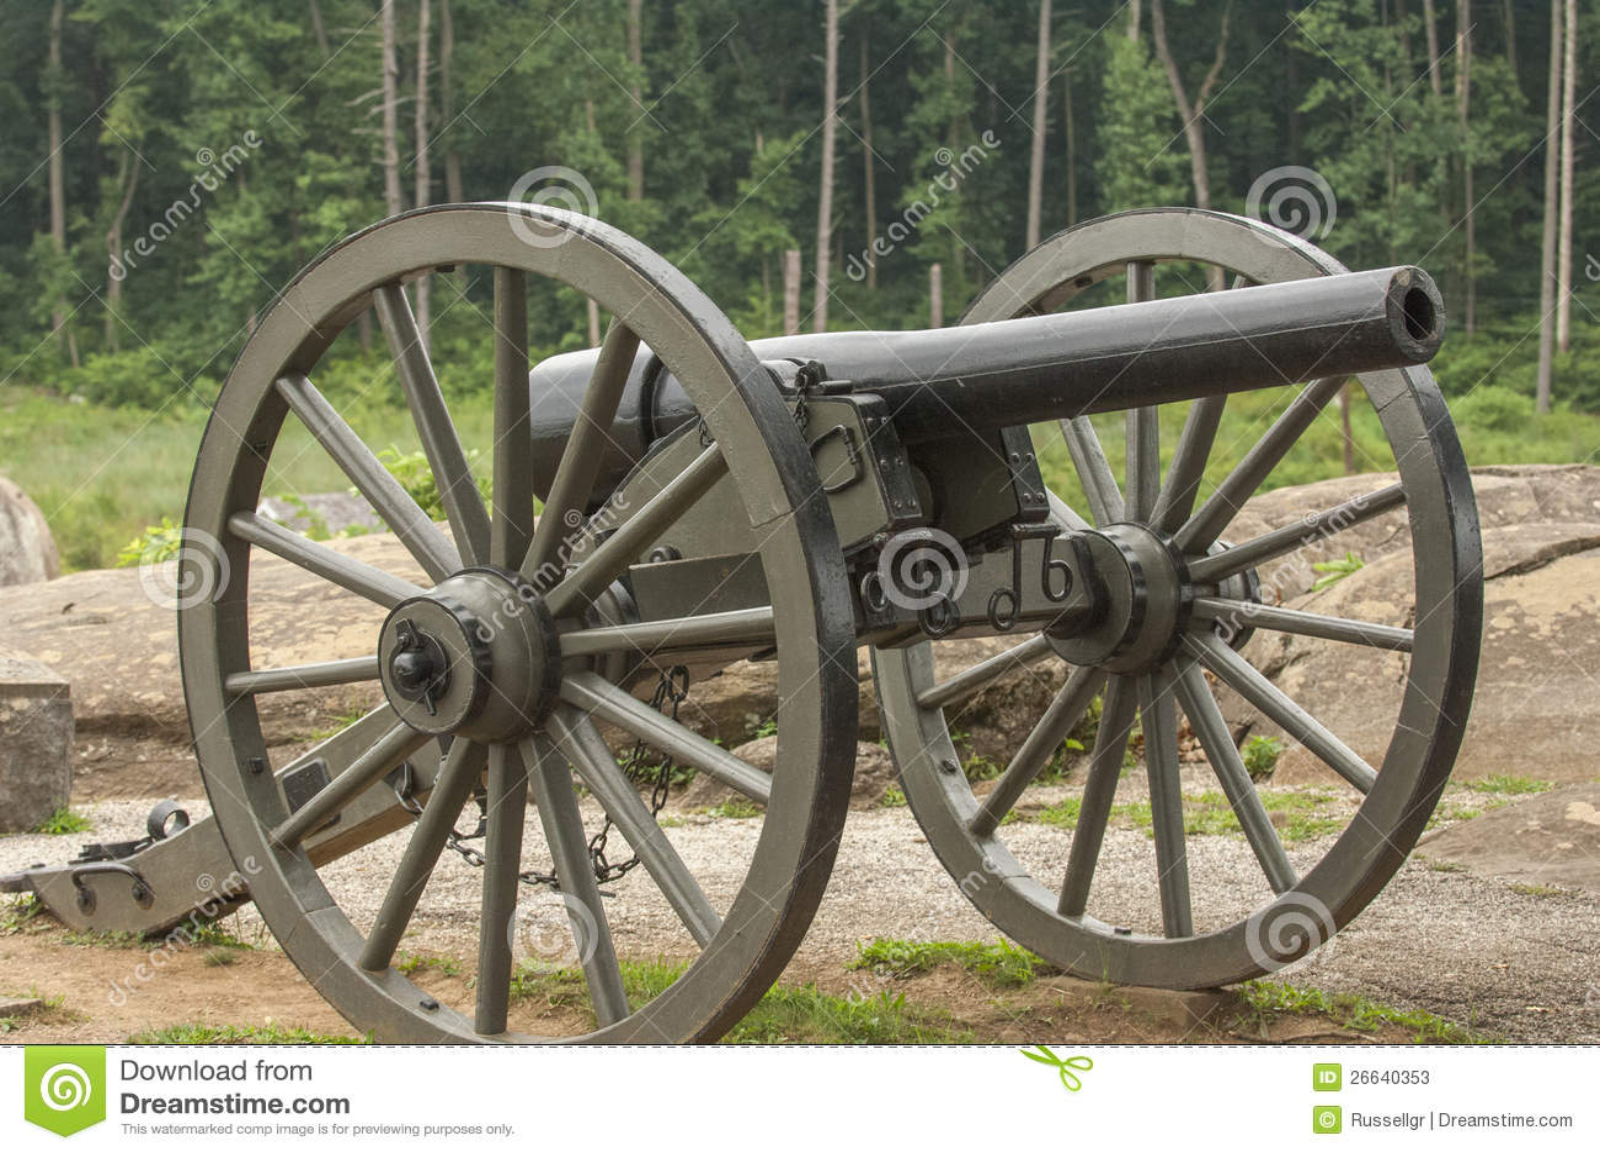 More similar stock images of civil war weapons